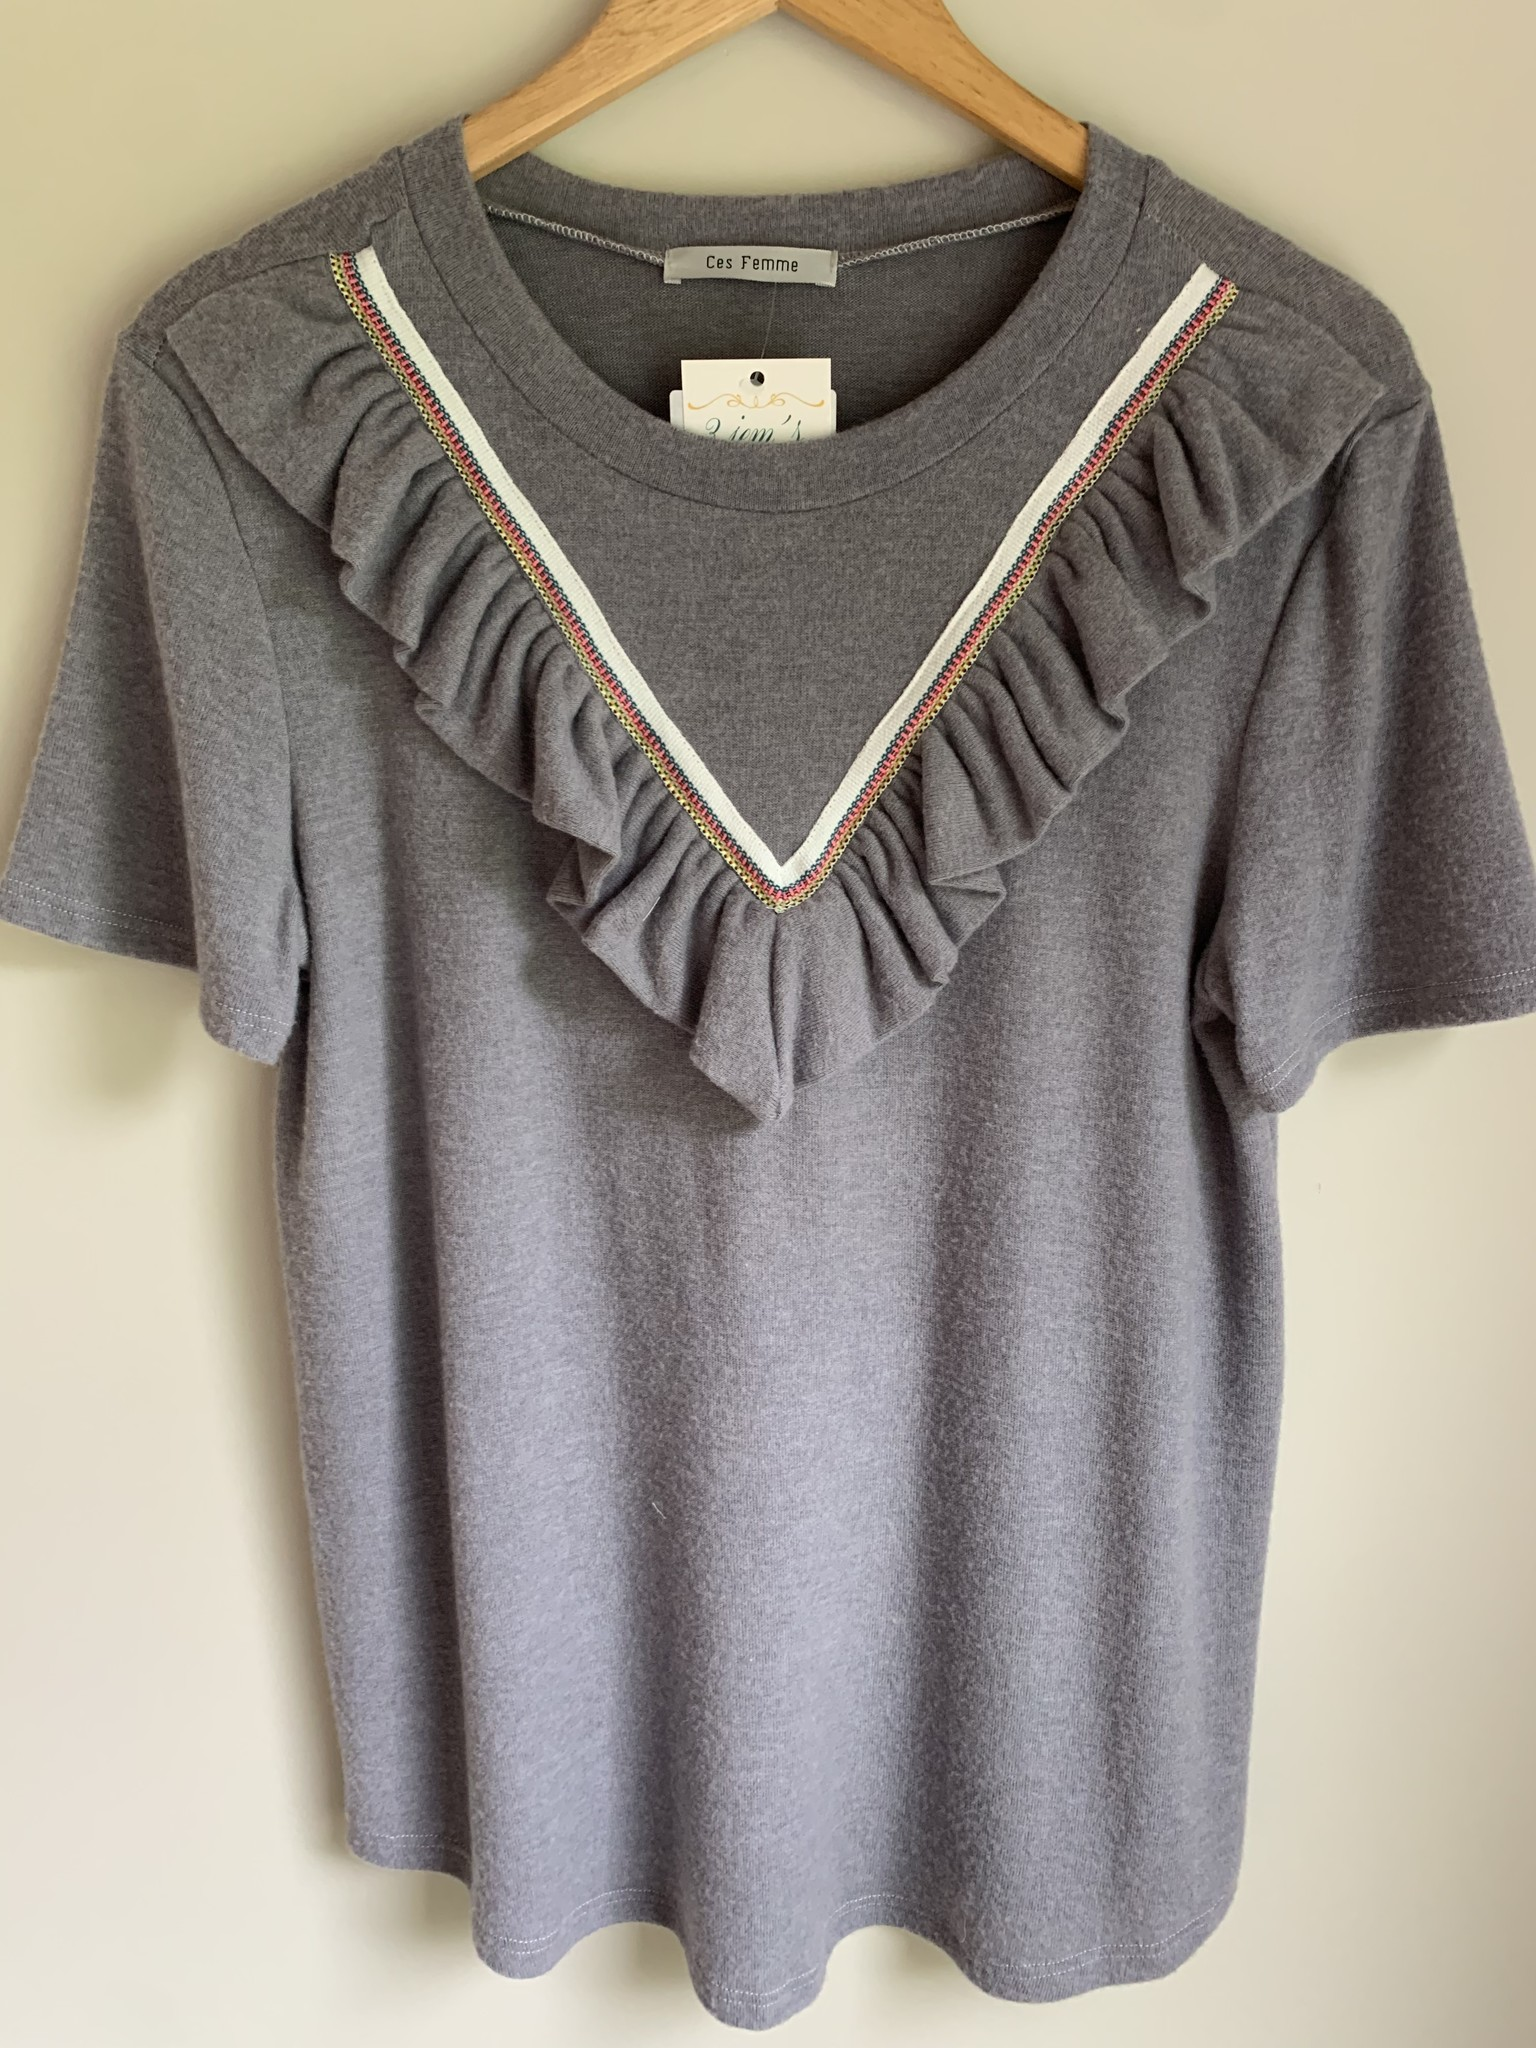 Ces Femme Grey Overlay Collar Detail Top